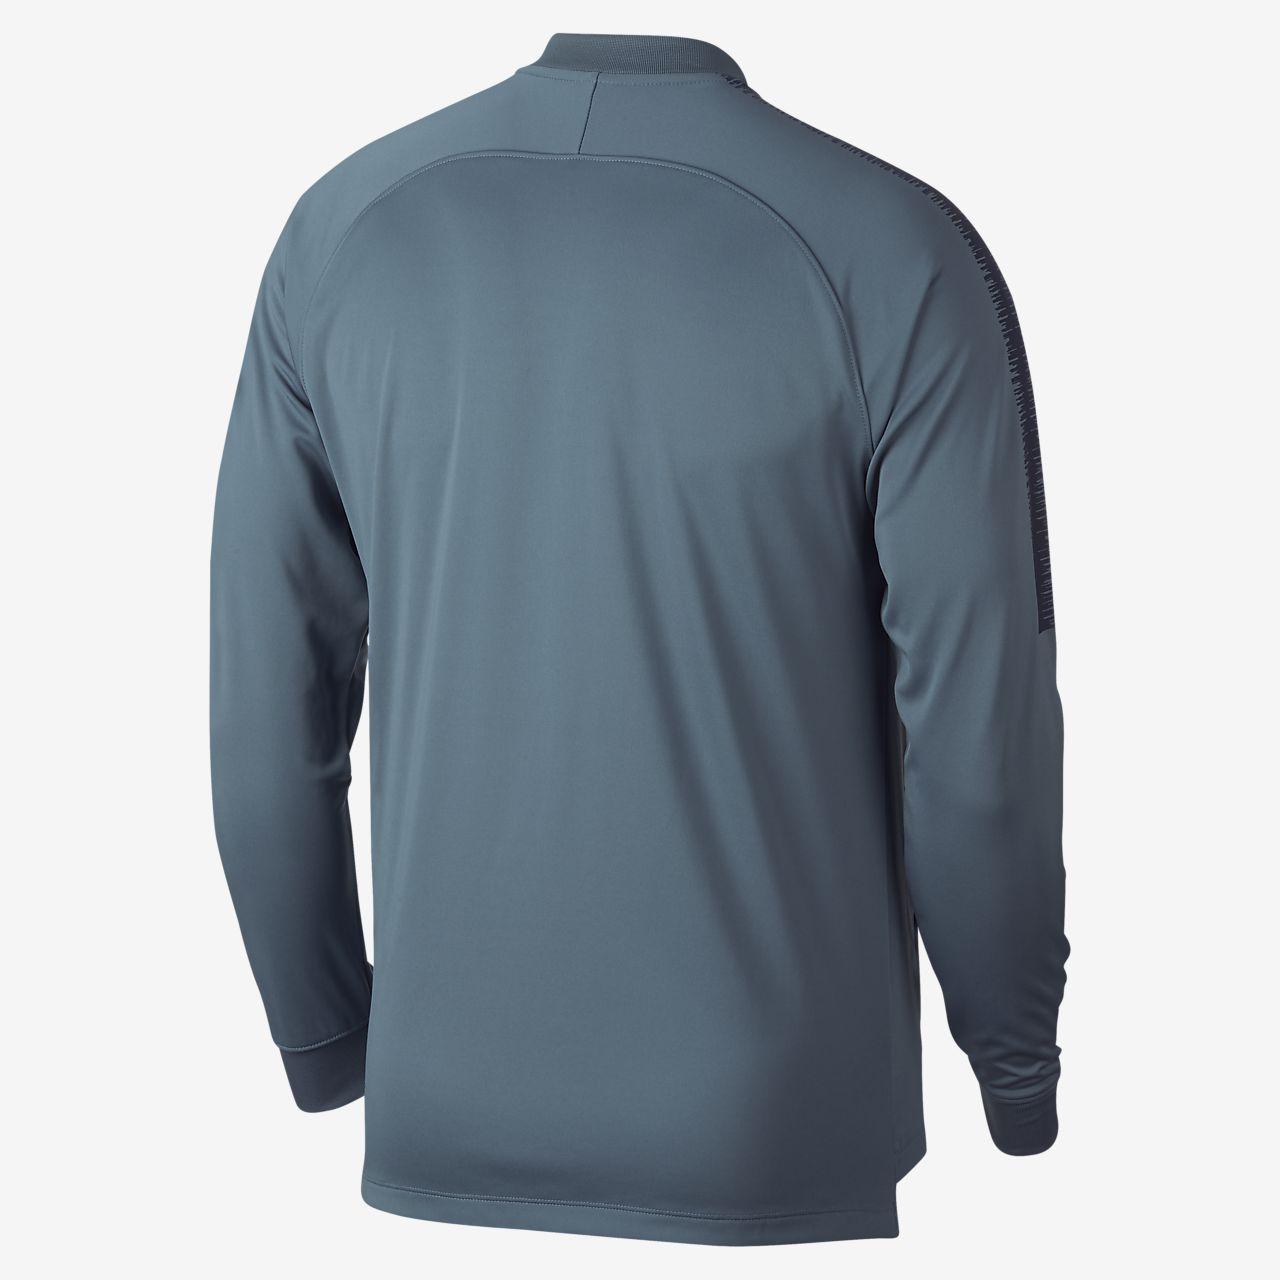 6e70c46dc Chelsea FC Dri-FIT Squad Men s Football Track Jacket. Nike.com LU